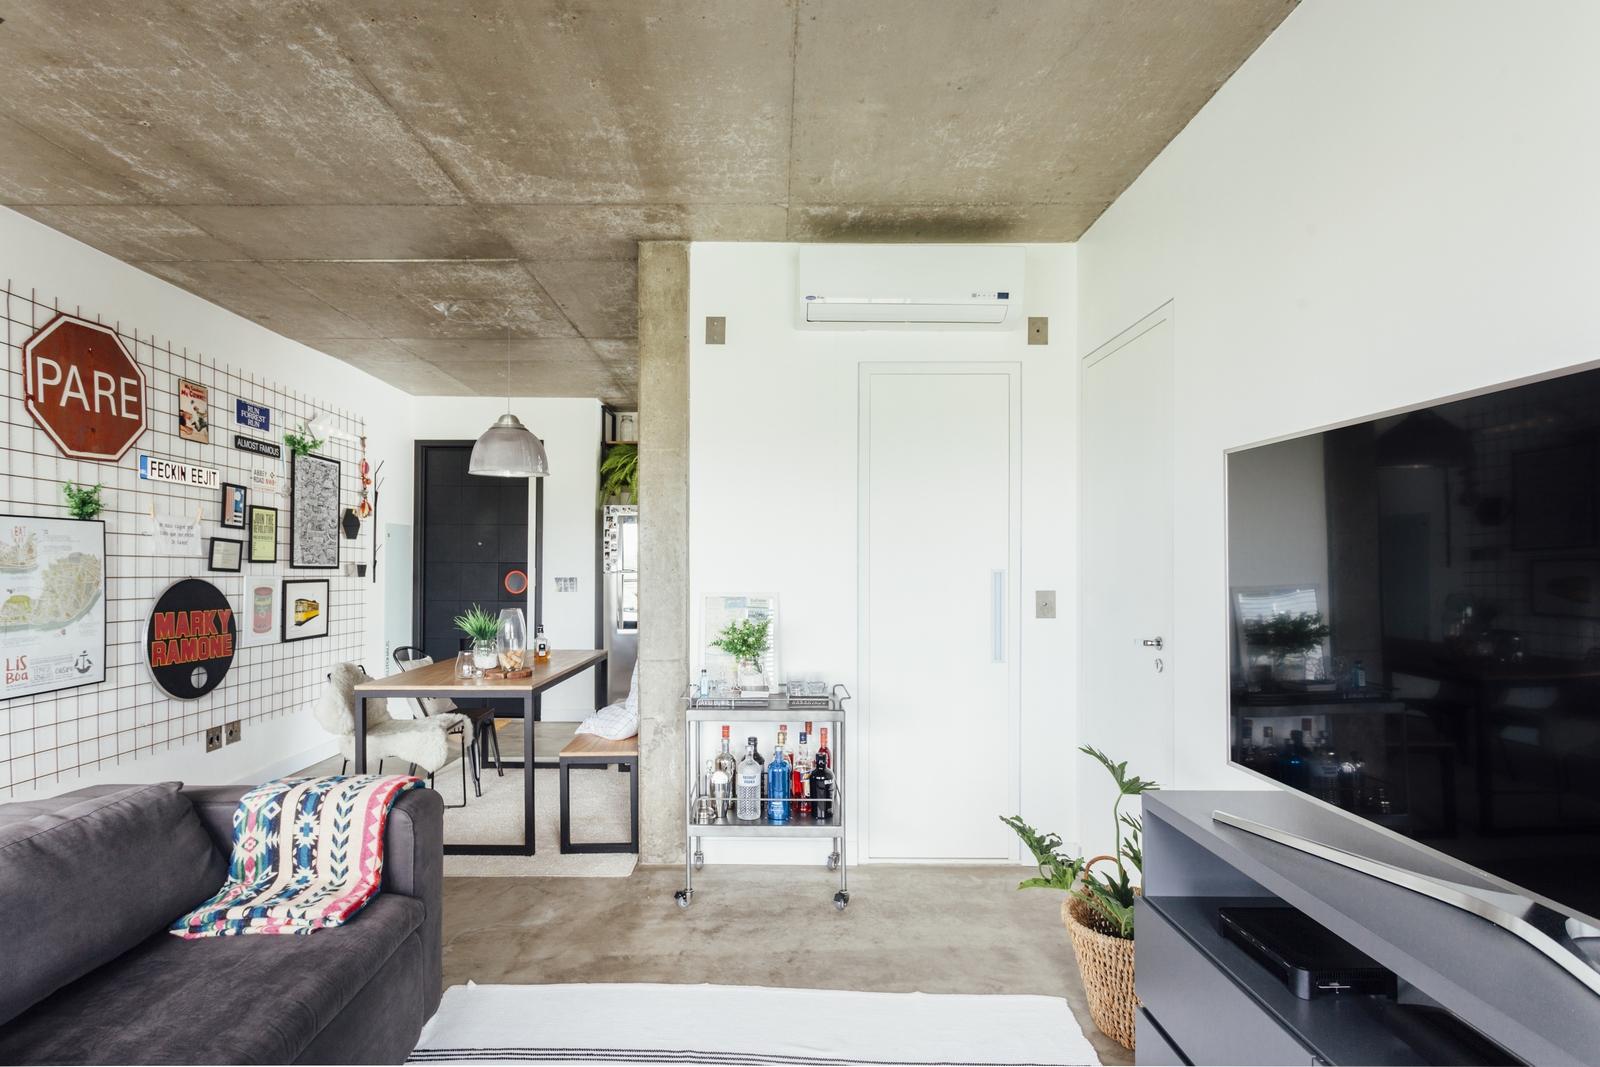 Apartamento Maxhaus -15 (Copiar)